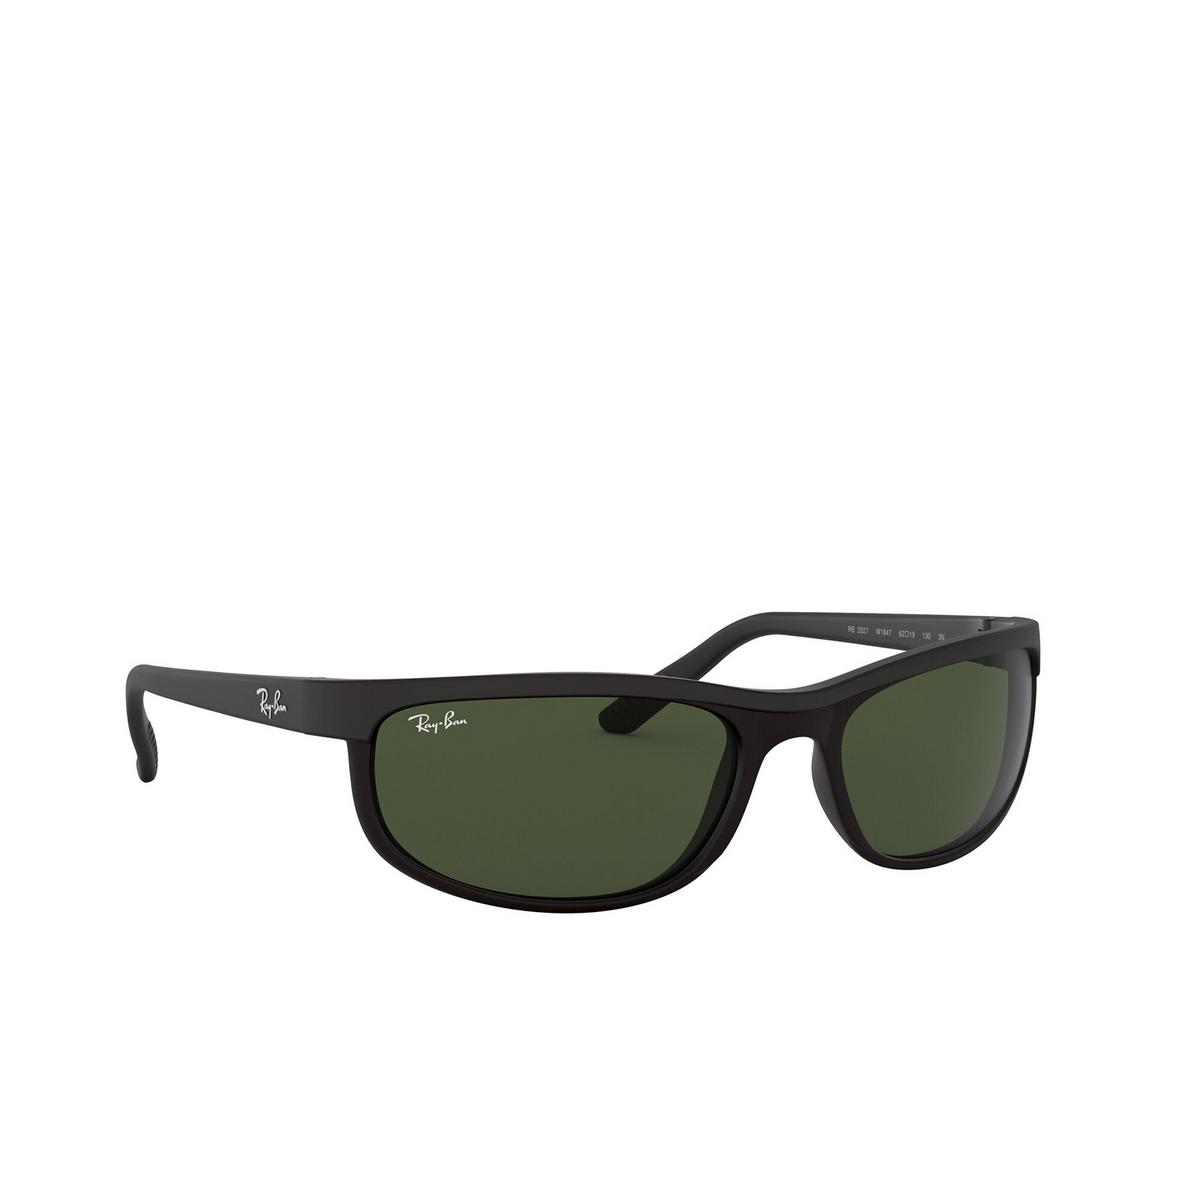 Ray-Ban® Rectangle Sunglasses: Predator 2 RB2027 color Black W1847 - 2/3.